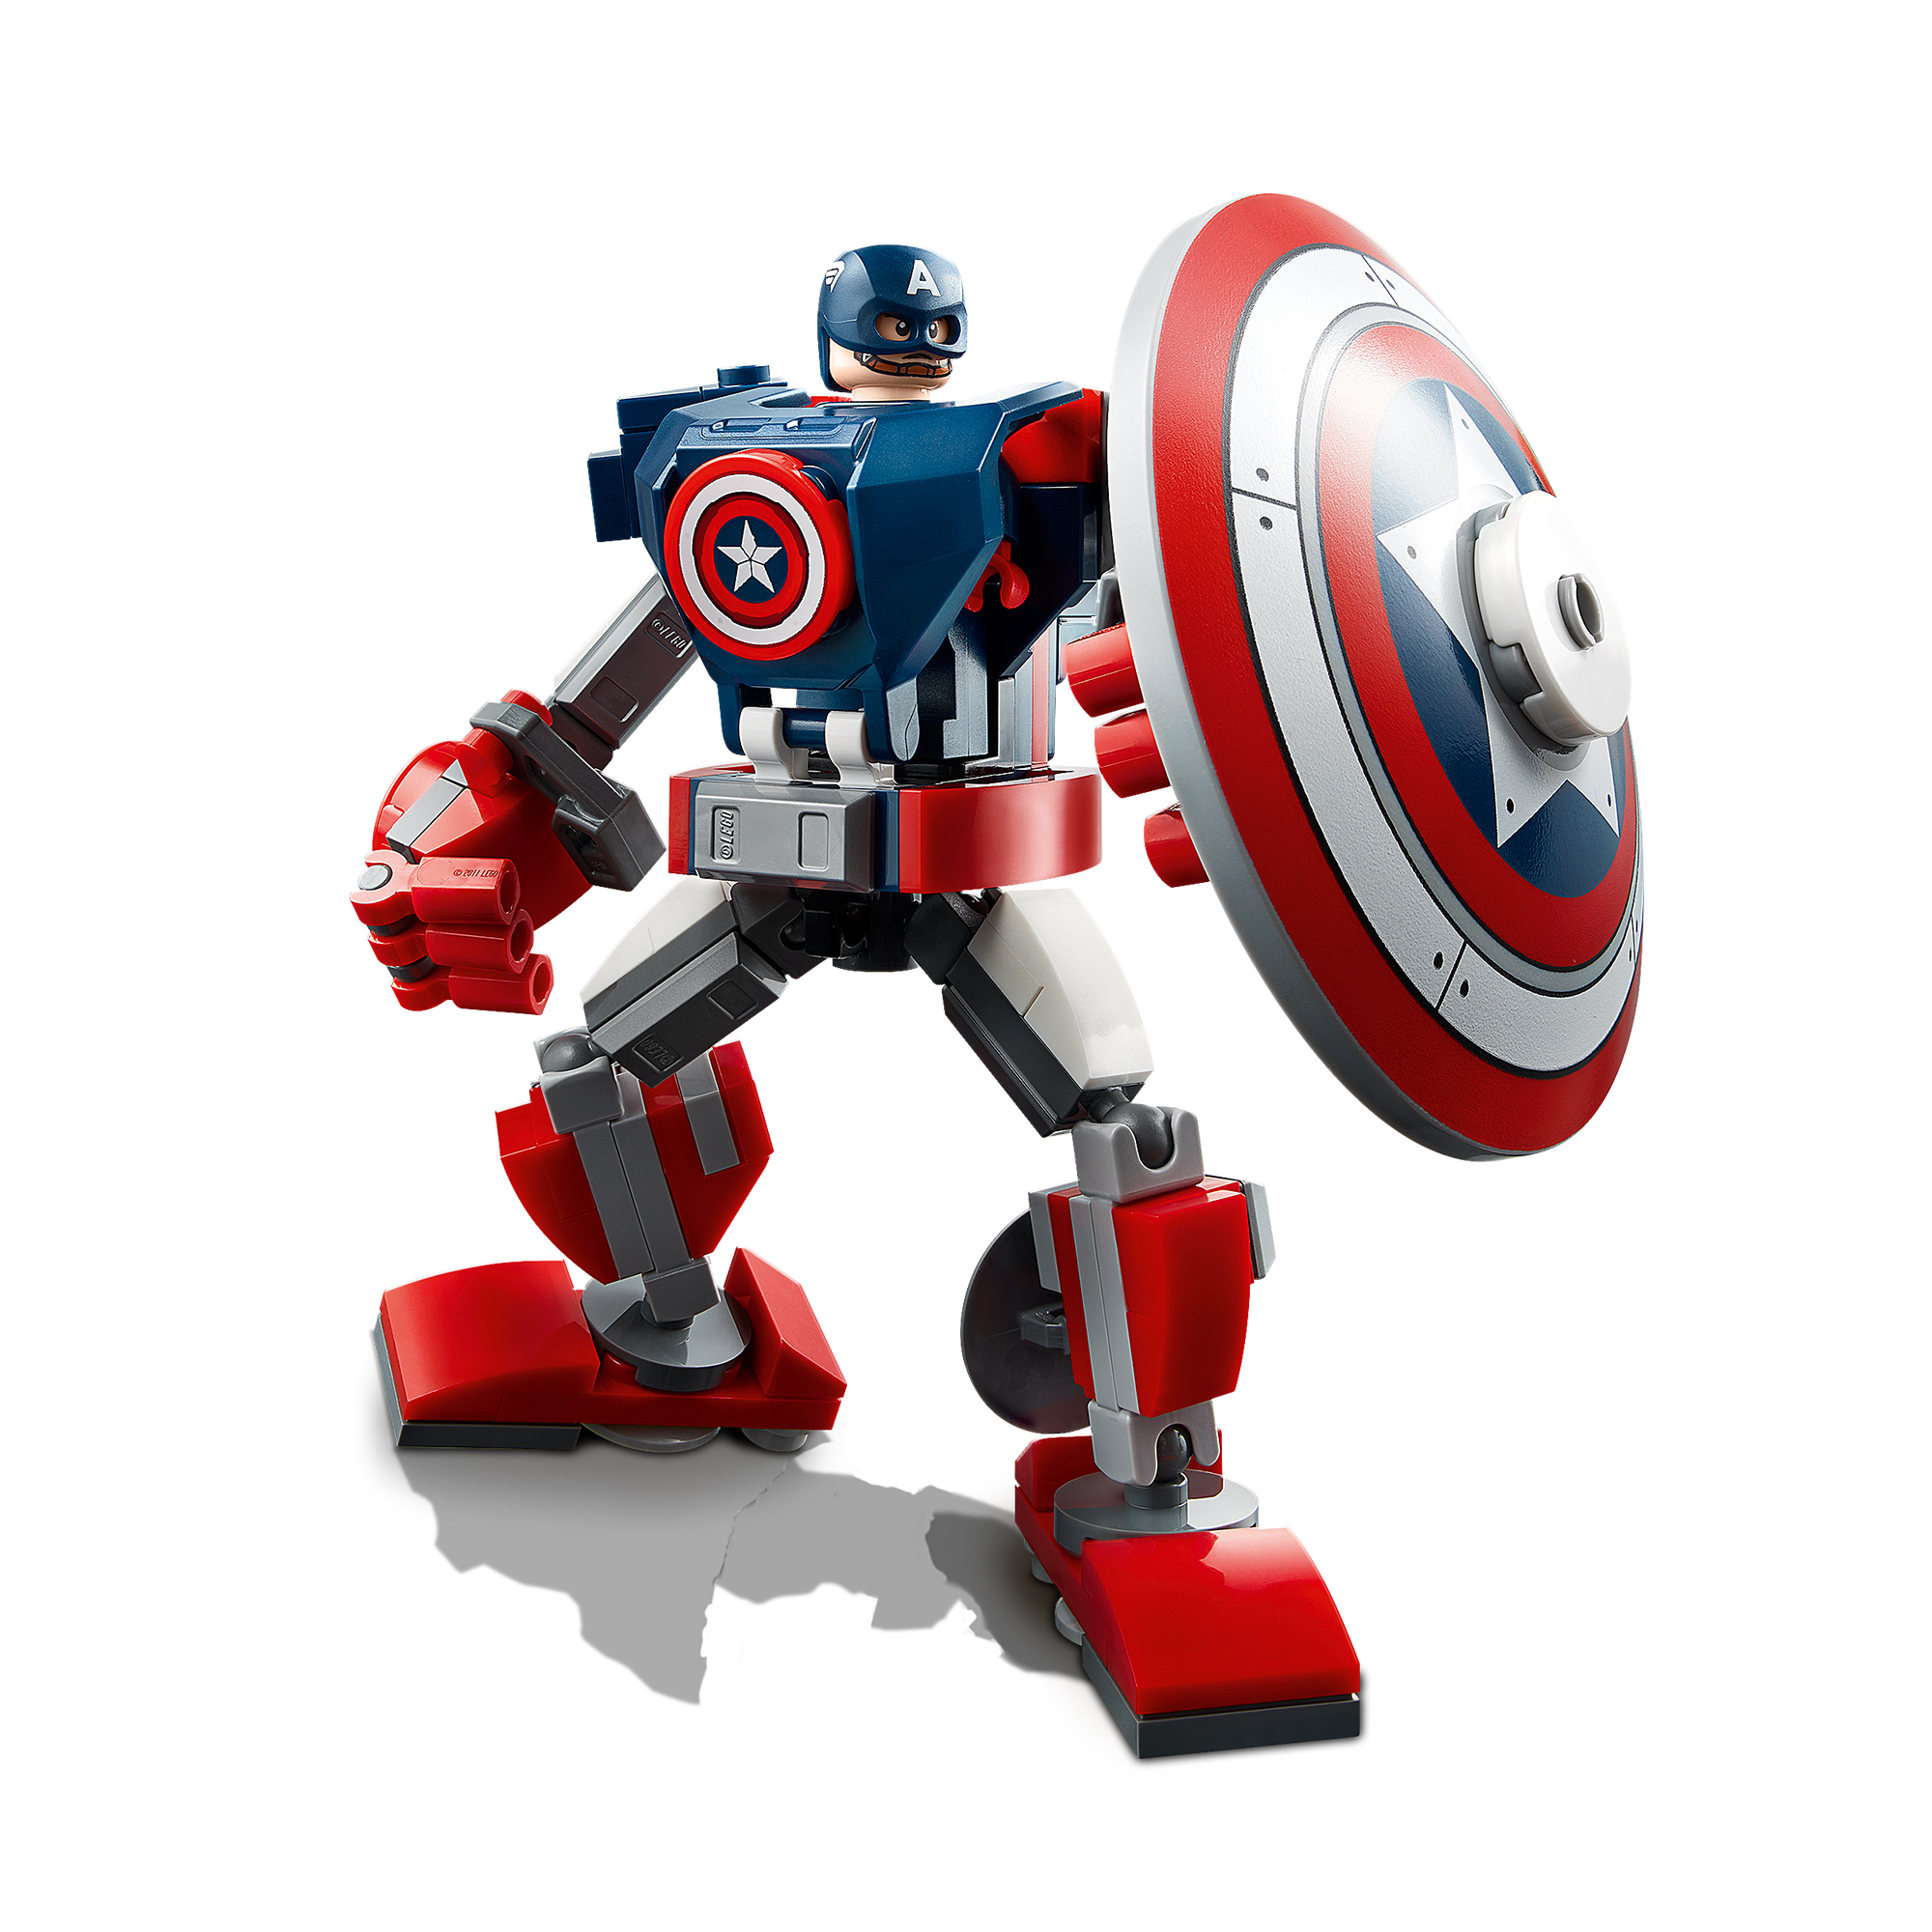 Lego marvel super heroes captain america mech armor -76168 - Marvel Super Heroes